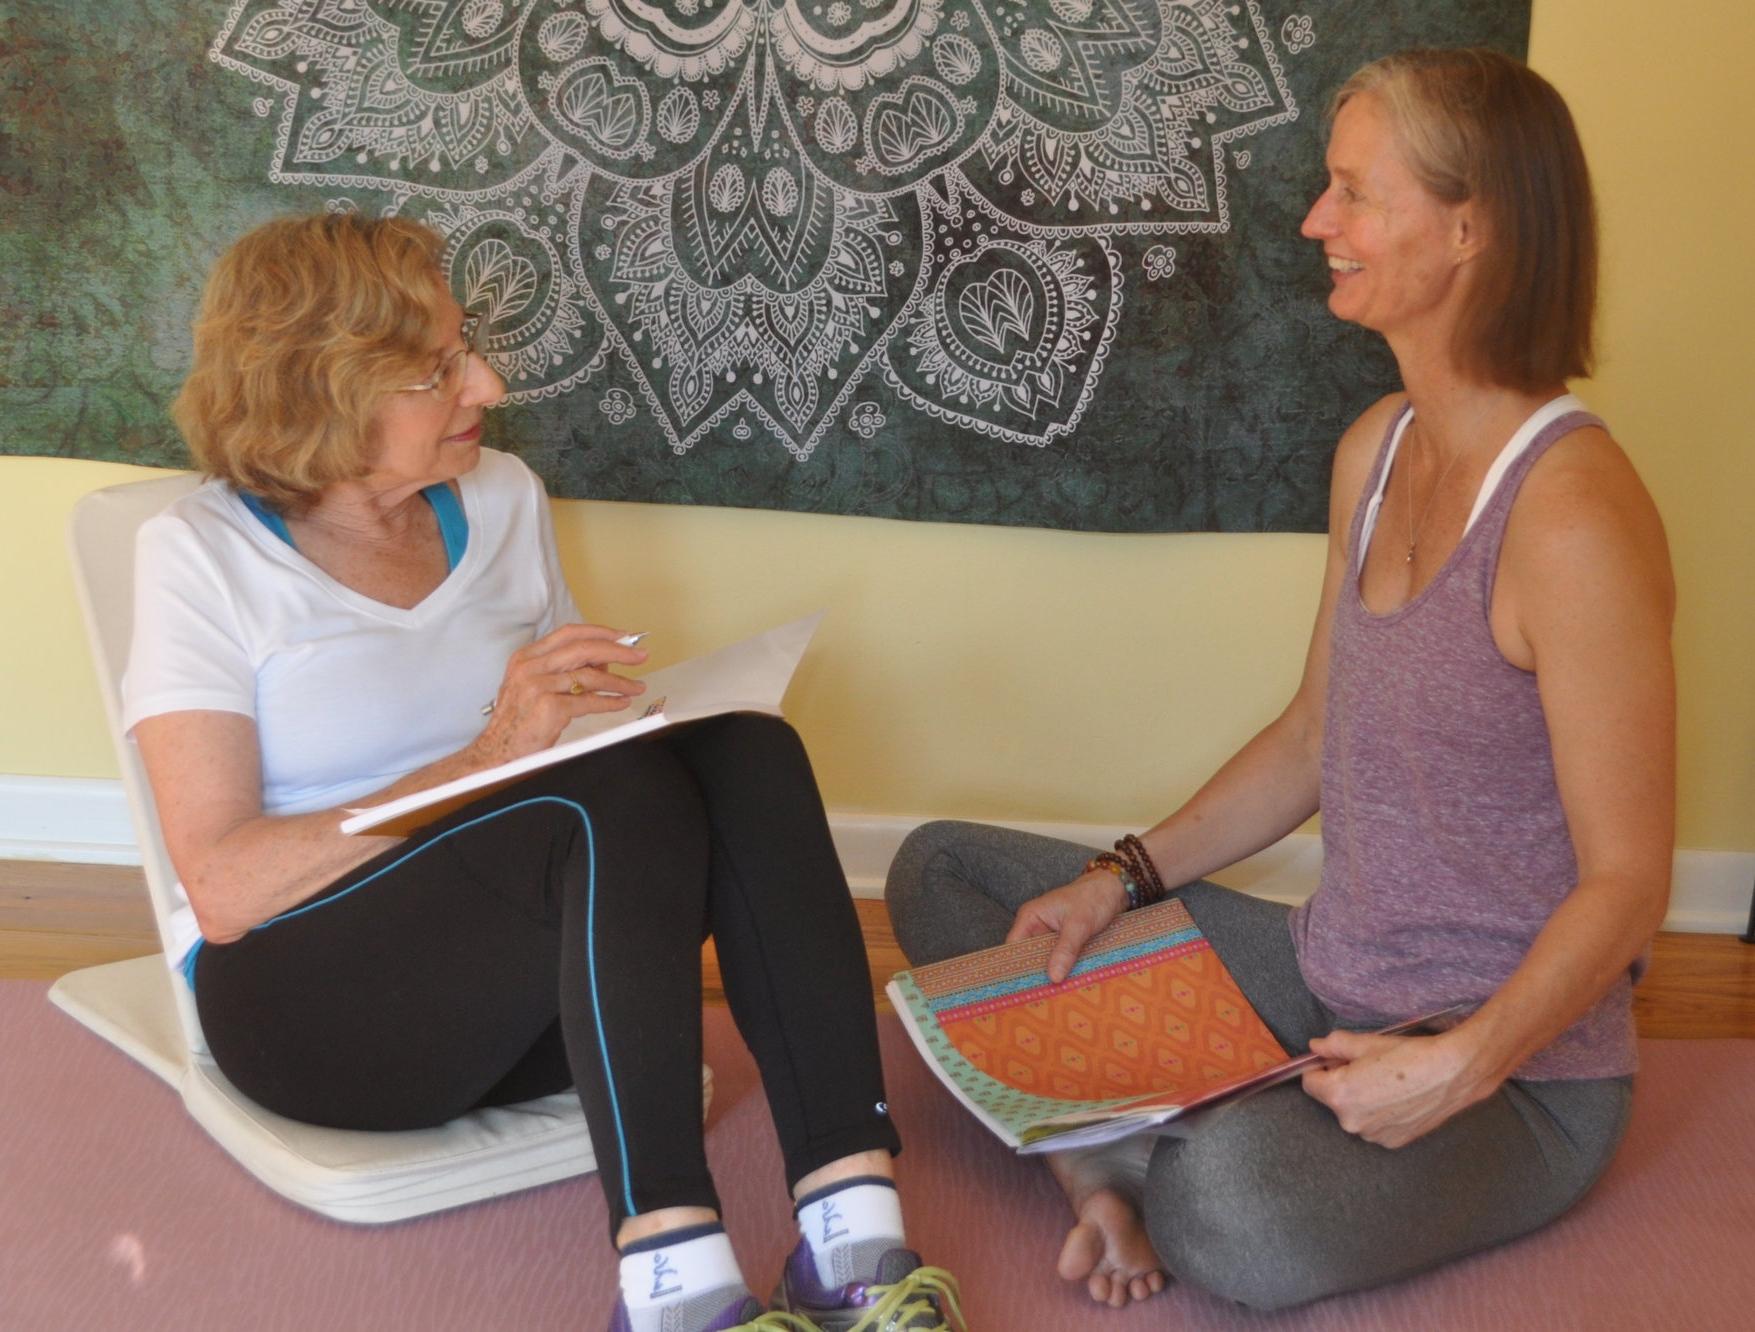 Yoga Meditation Avondale PA 19311